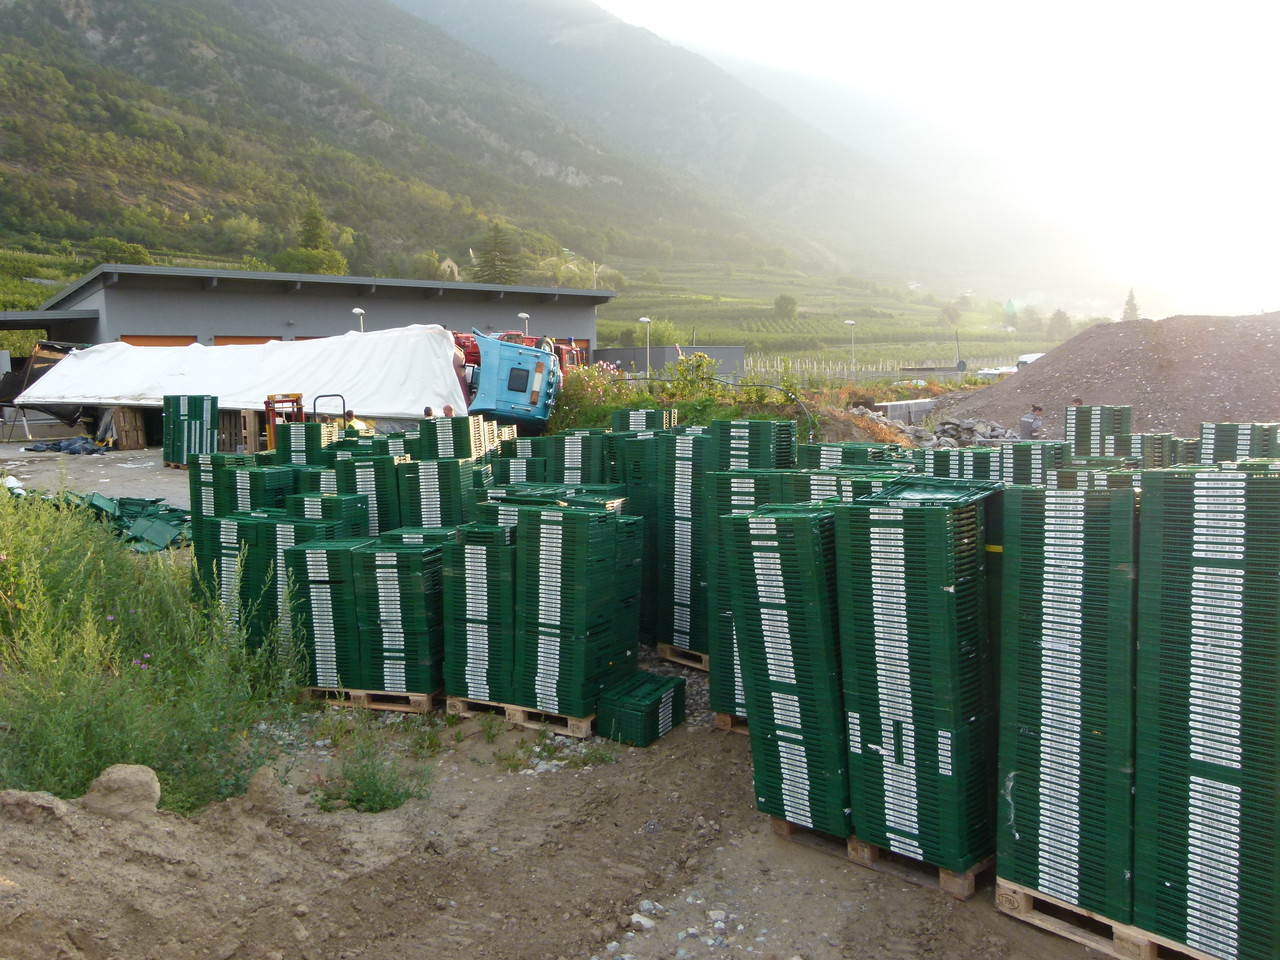 LKW-Unfall Höhe Würstelstand Vetzan